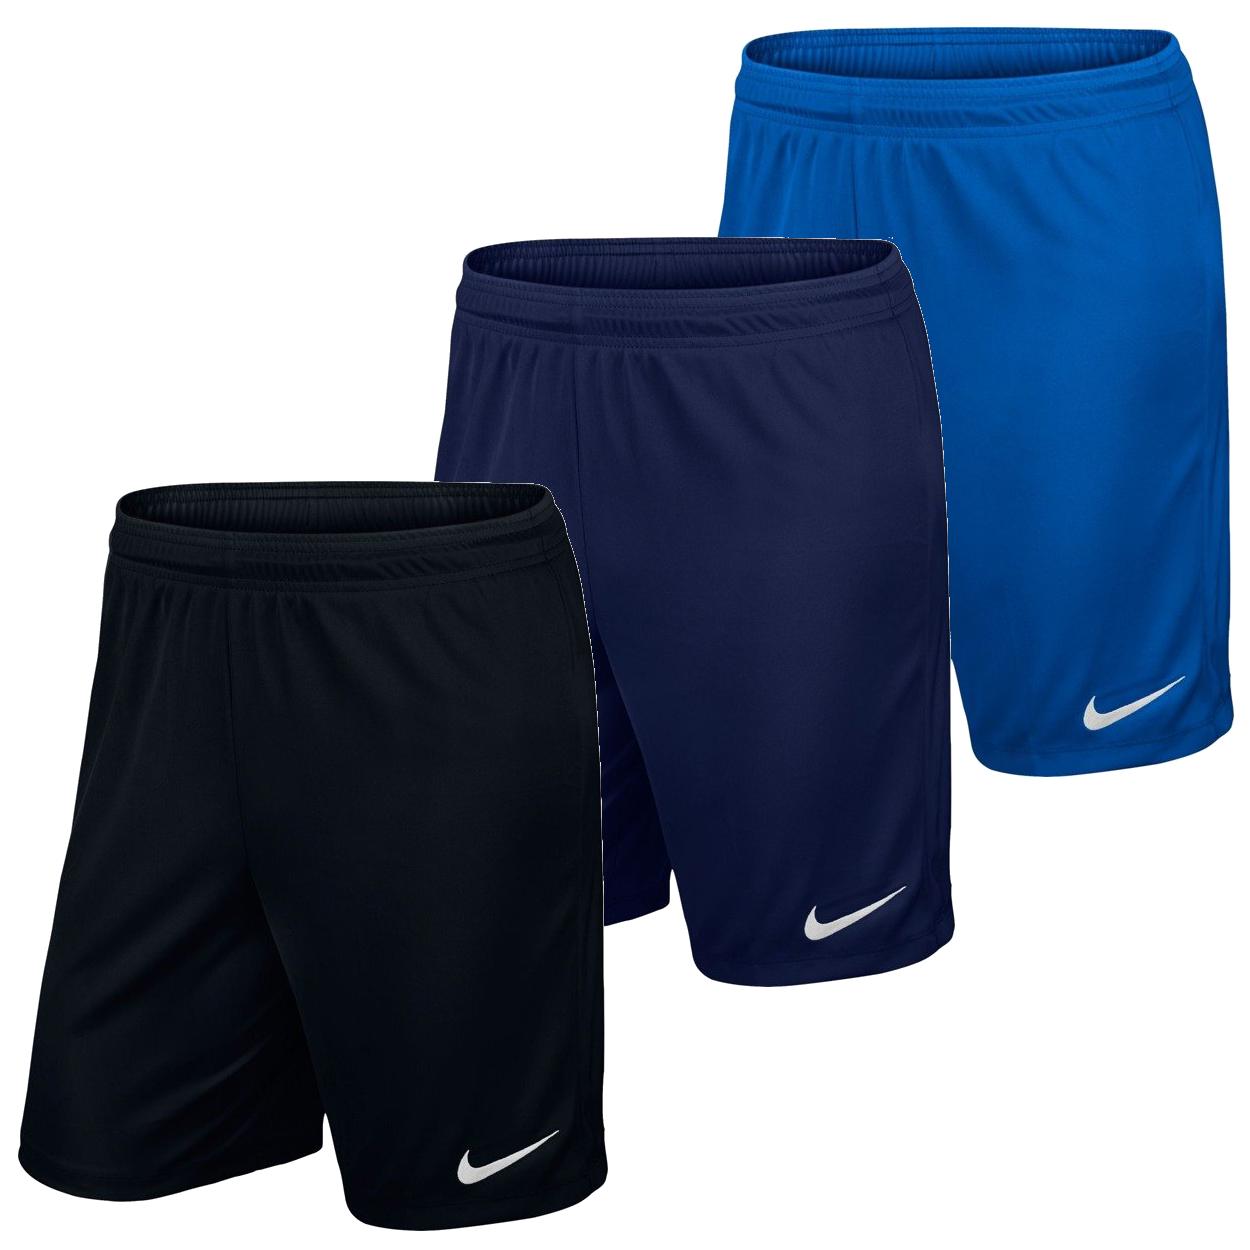 Nike Park II Knit Herren Shorts Sporthose Fußballshorts Dri-FIT Fitness Training